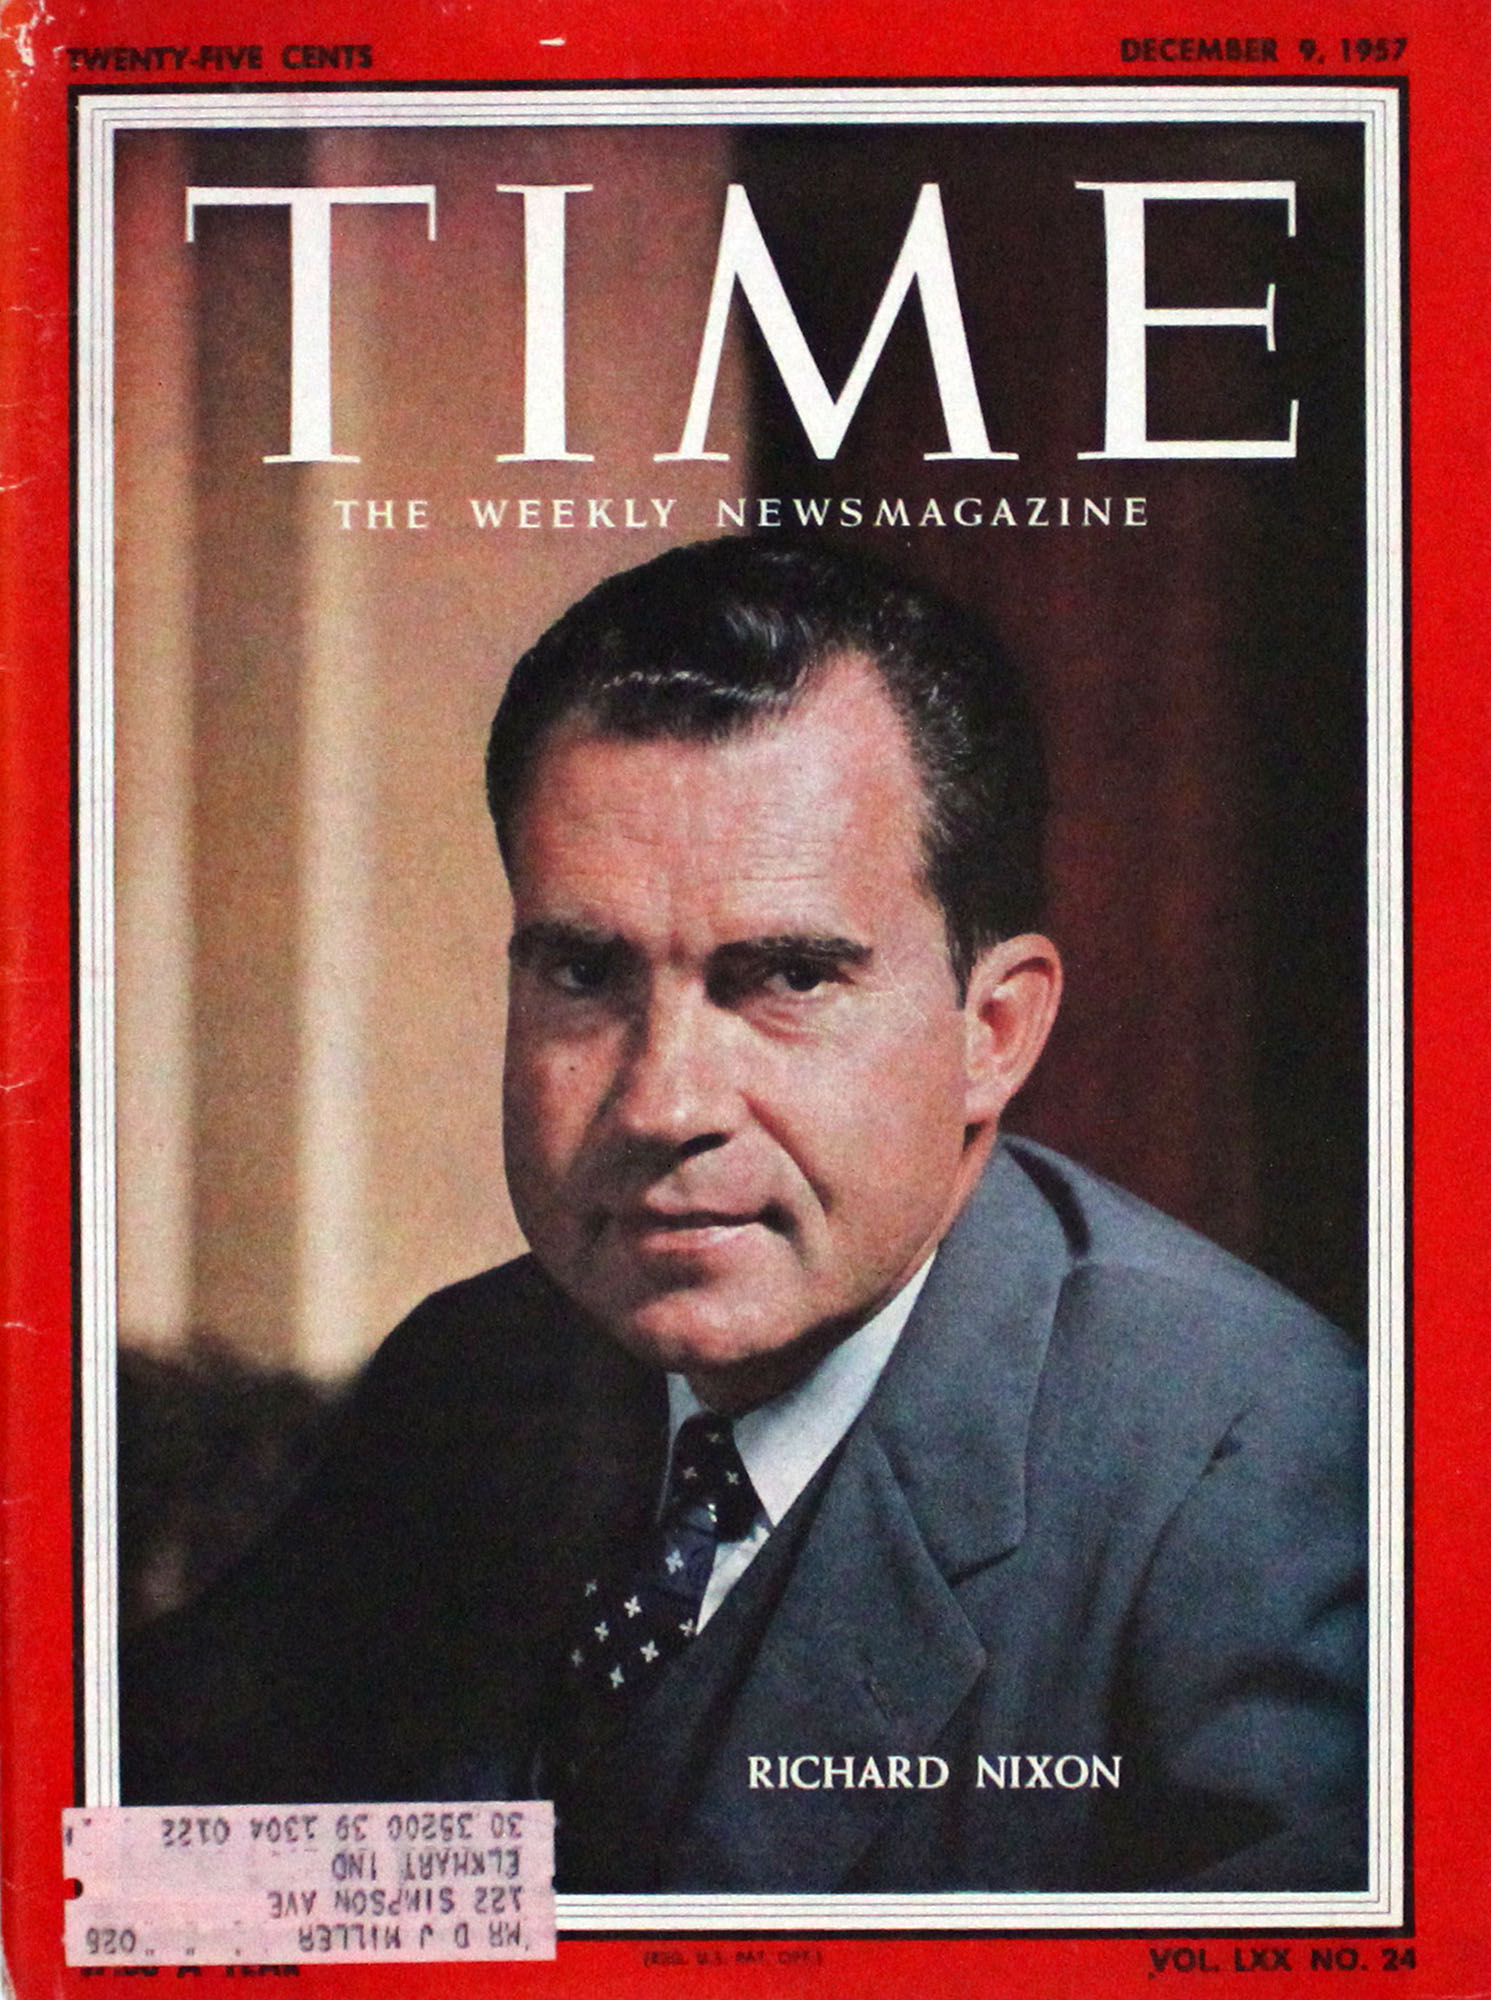 Time  Dec 9,1957